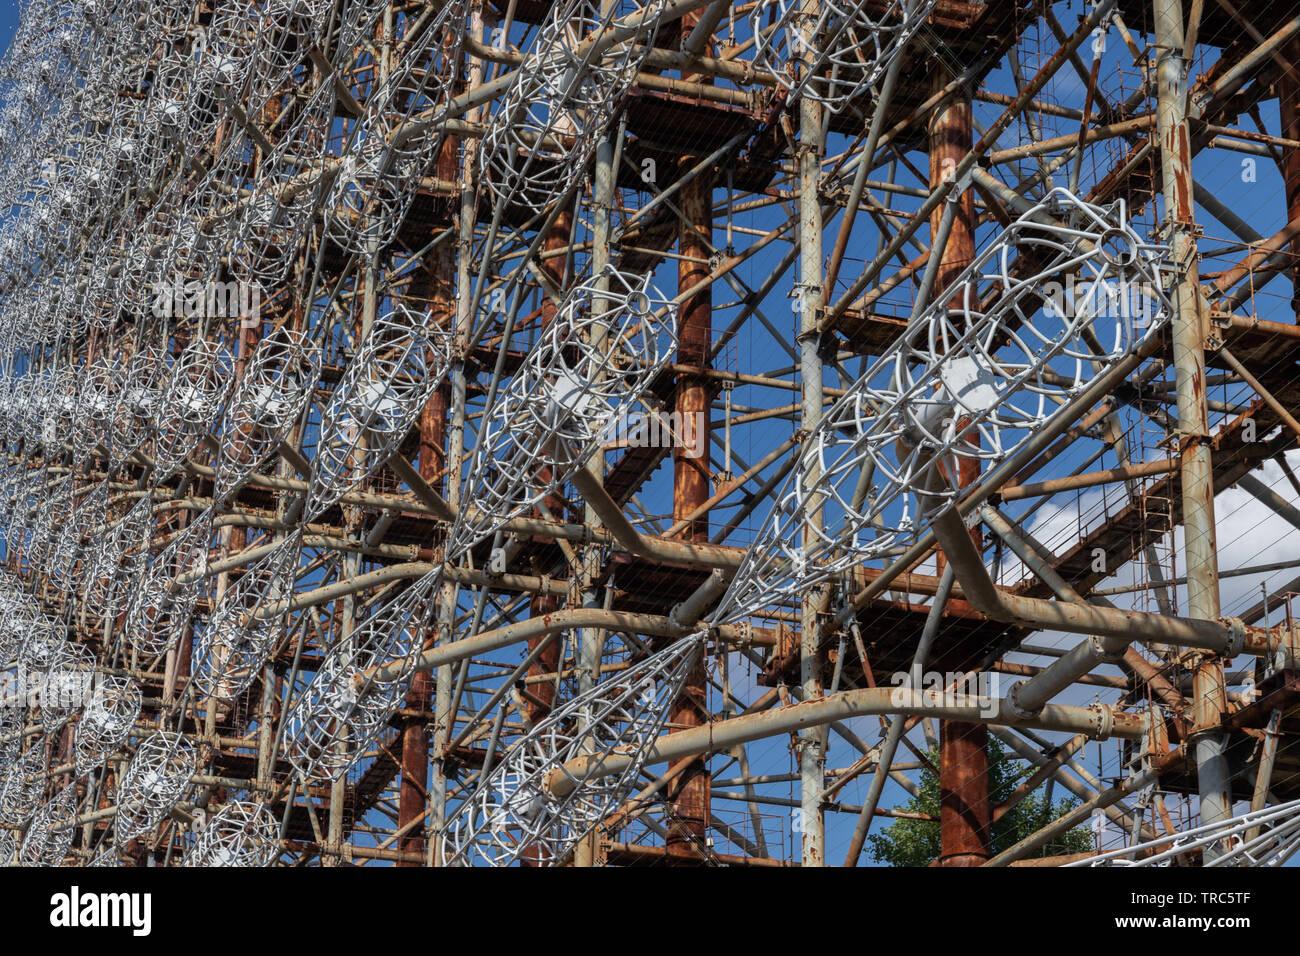 Ground view of Antenna of Soviet OTH-Radar Duga, known as Chernobyl-2,  Chernobyl Exclusion Zone, Ukraine - Stock Image